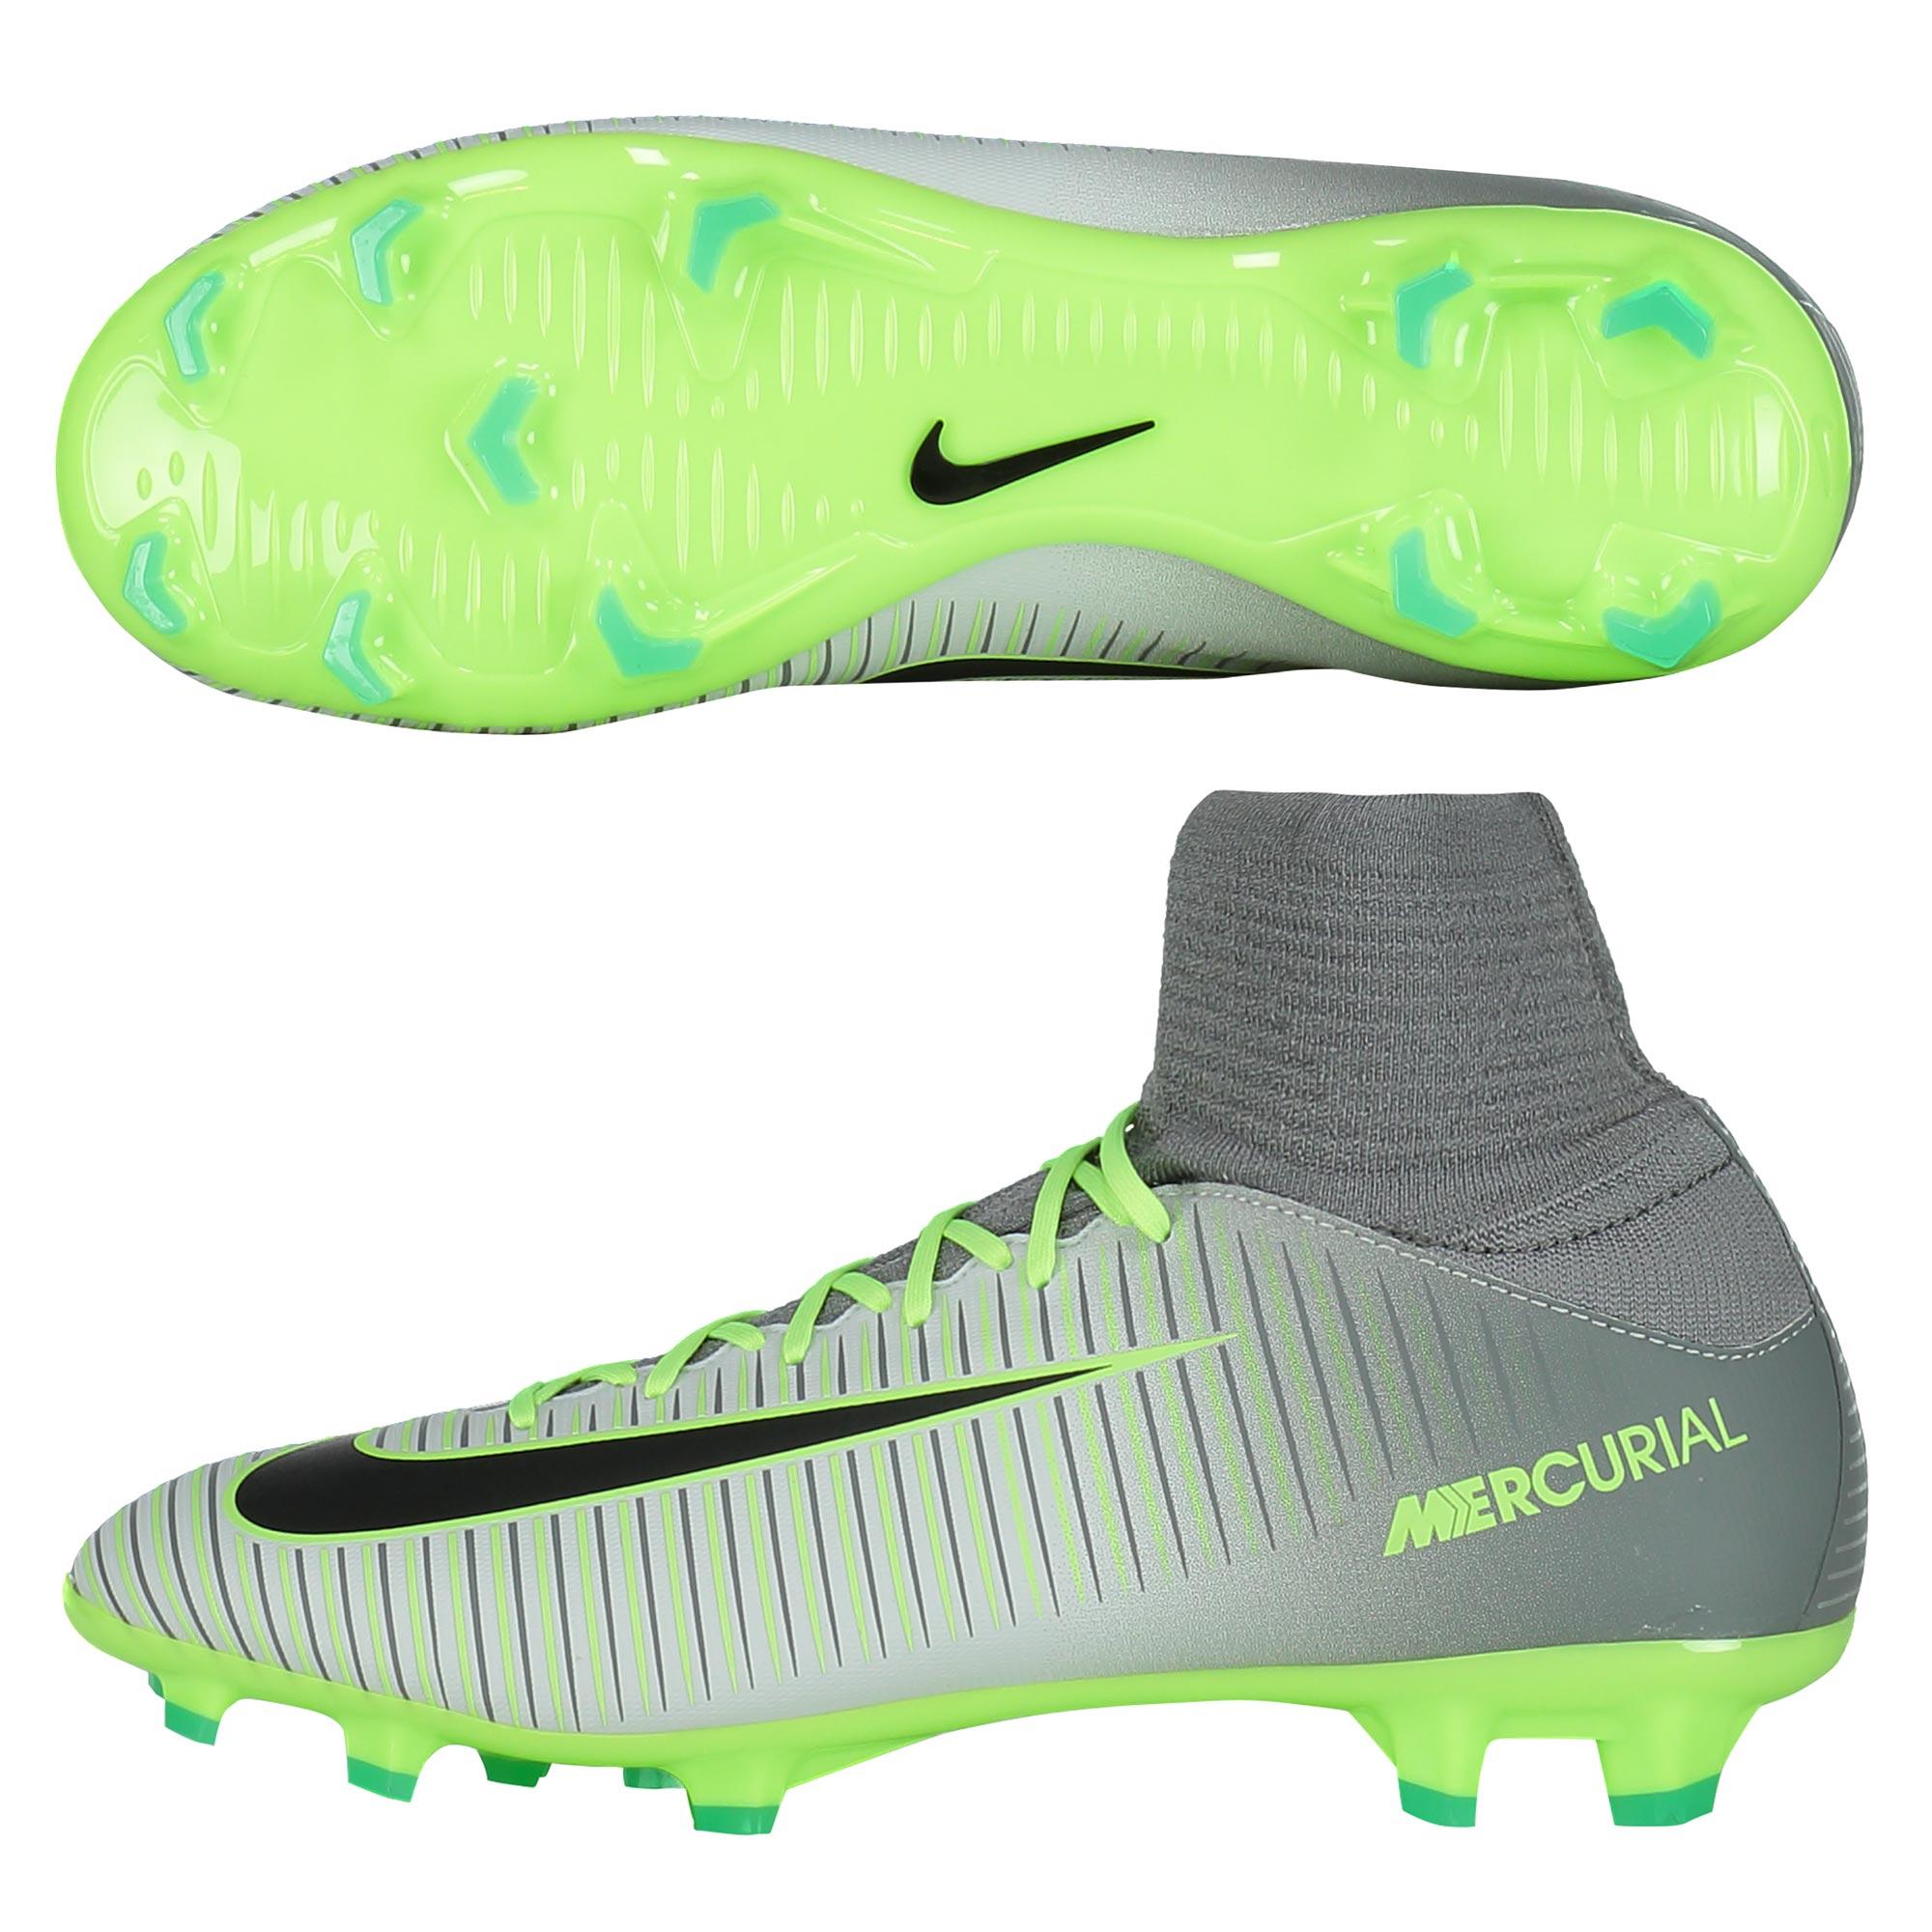 size 40 709b5 e6e50 Nike Mercurial Superfly V Flyknit Elite Pack FG Kids Football Boots Grey